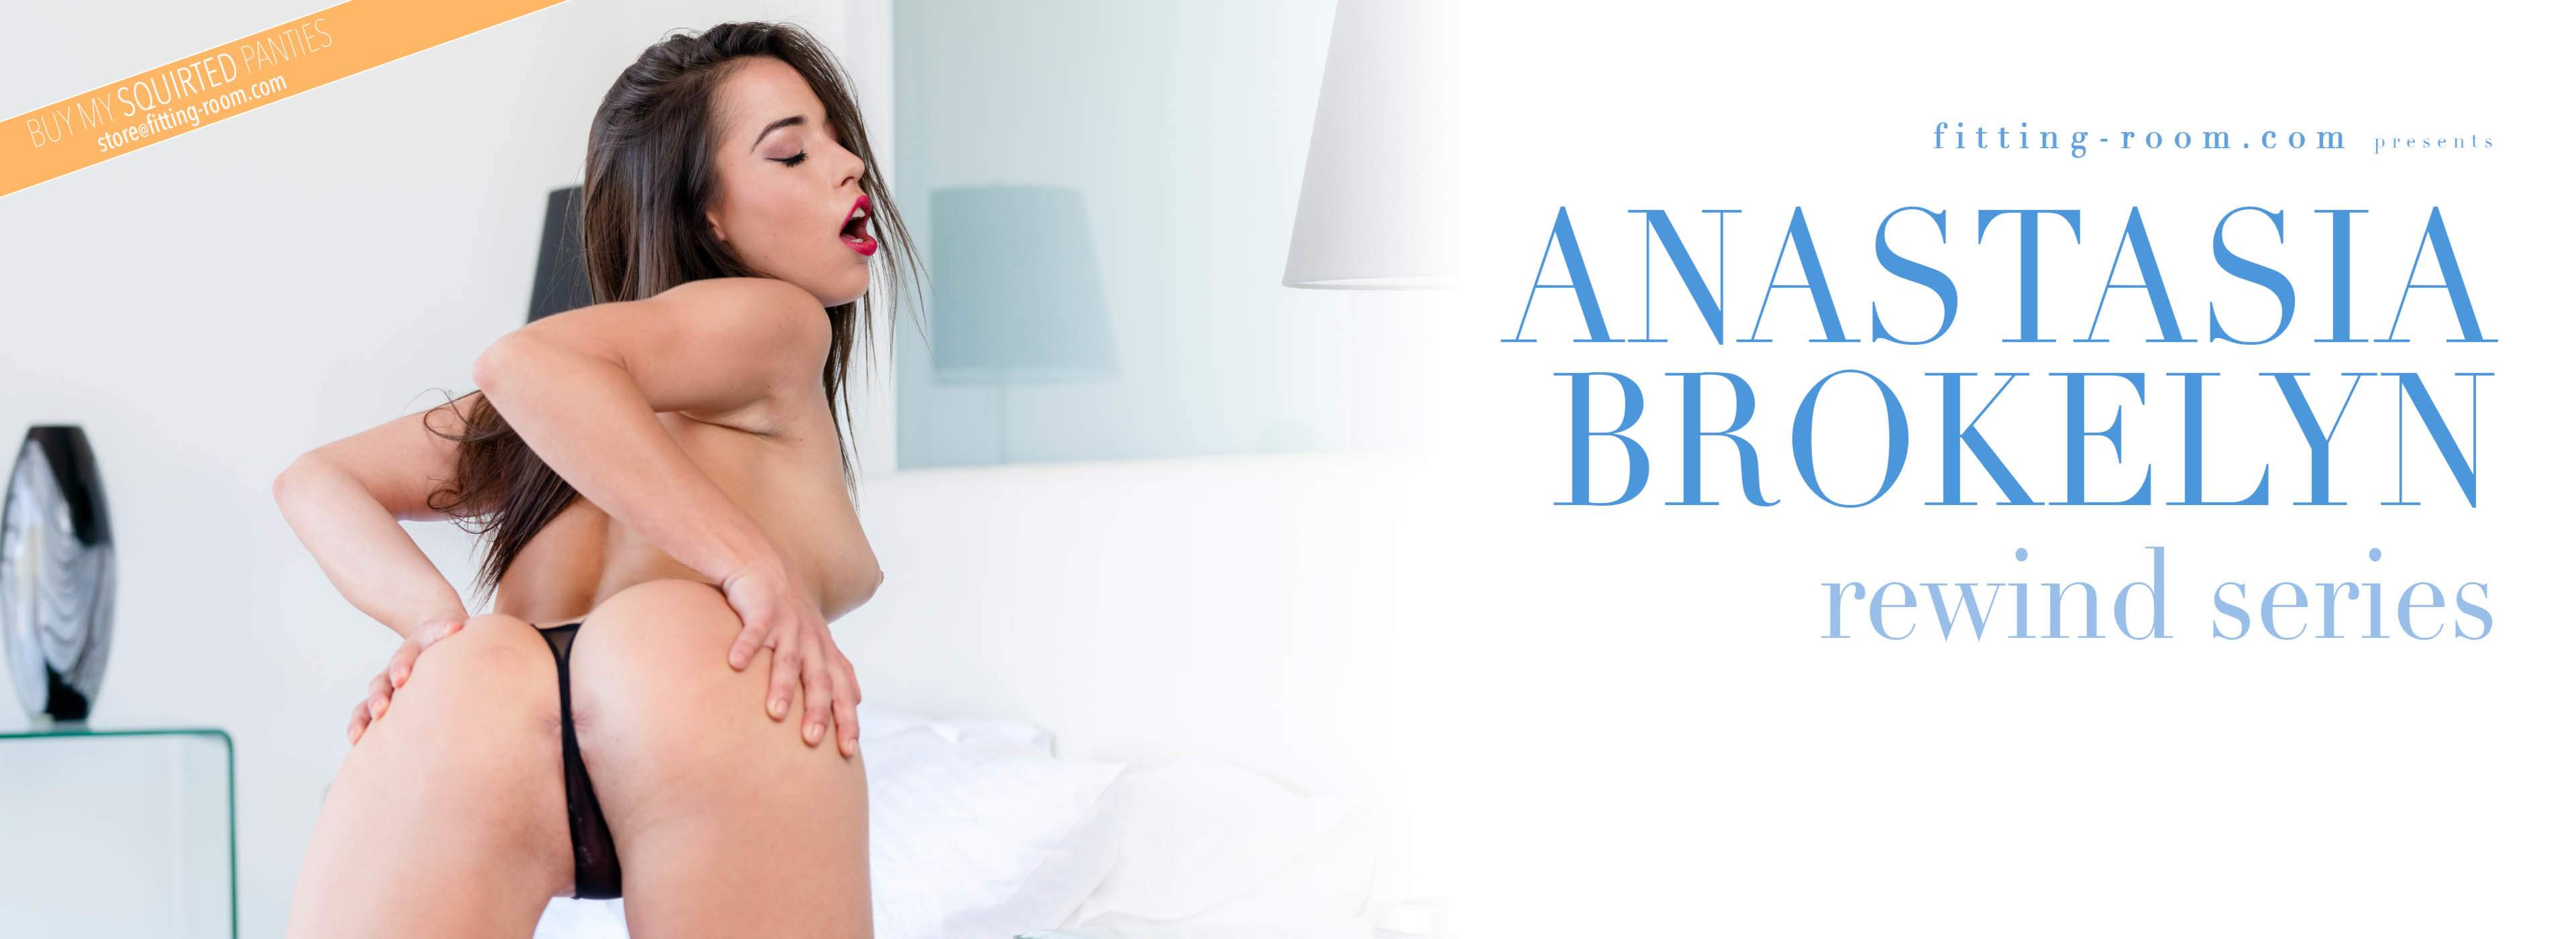 Anastasia Brokelyn | Nasty Chica